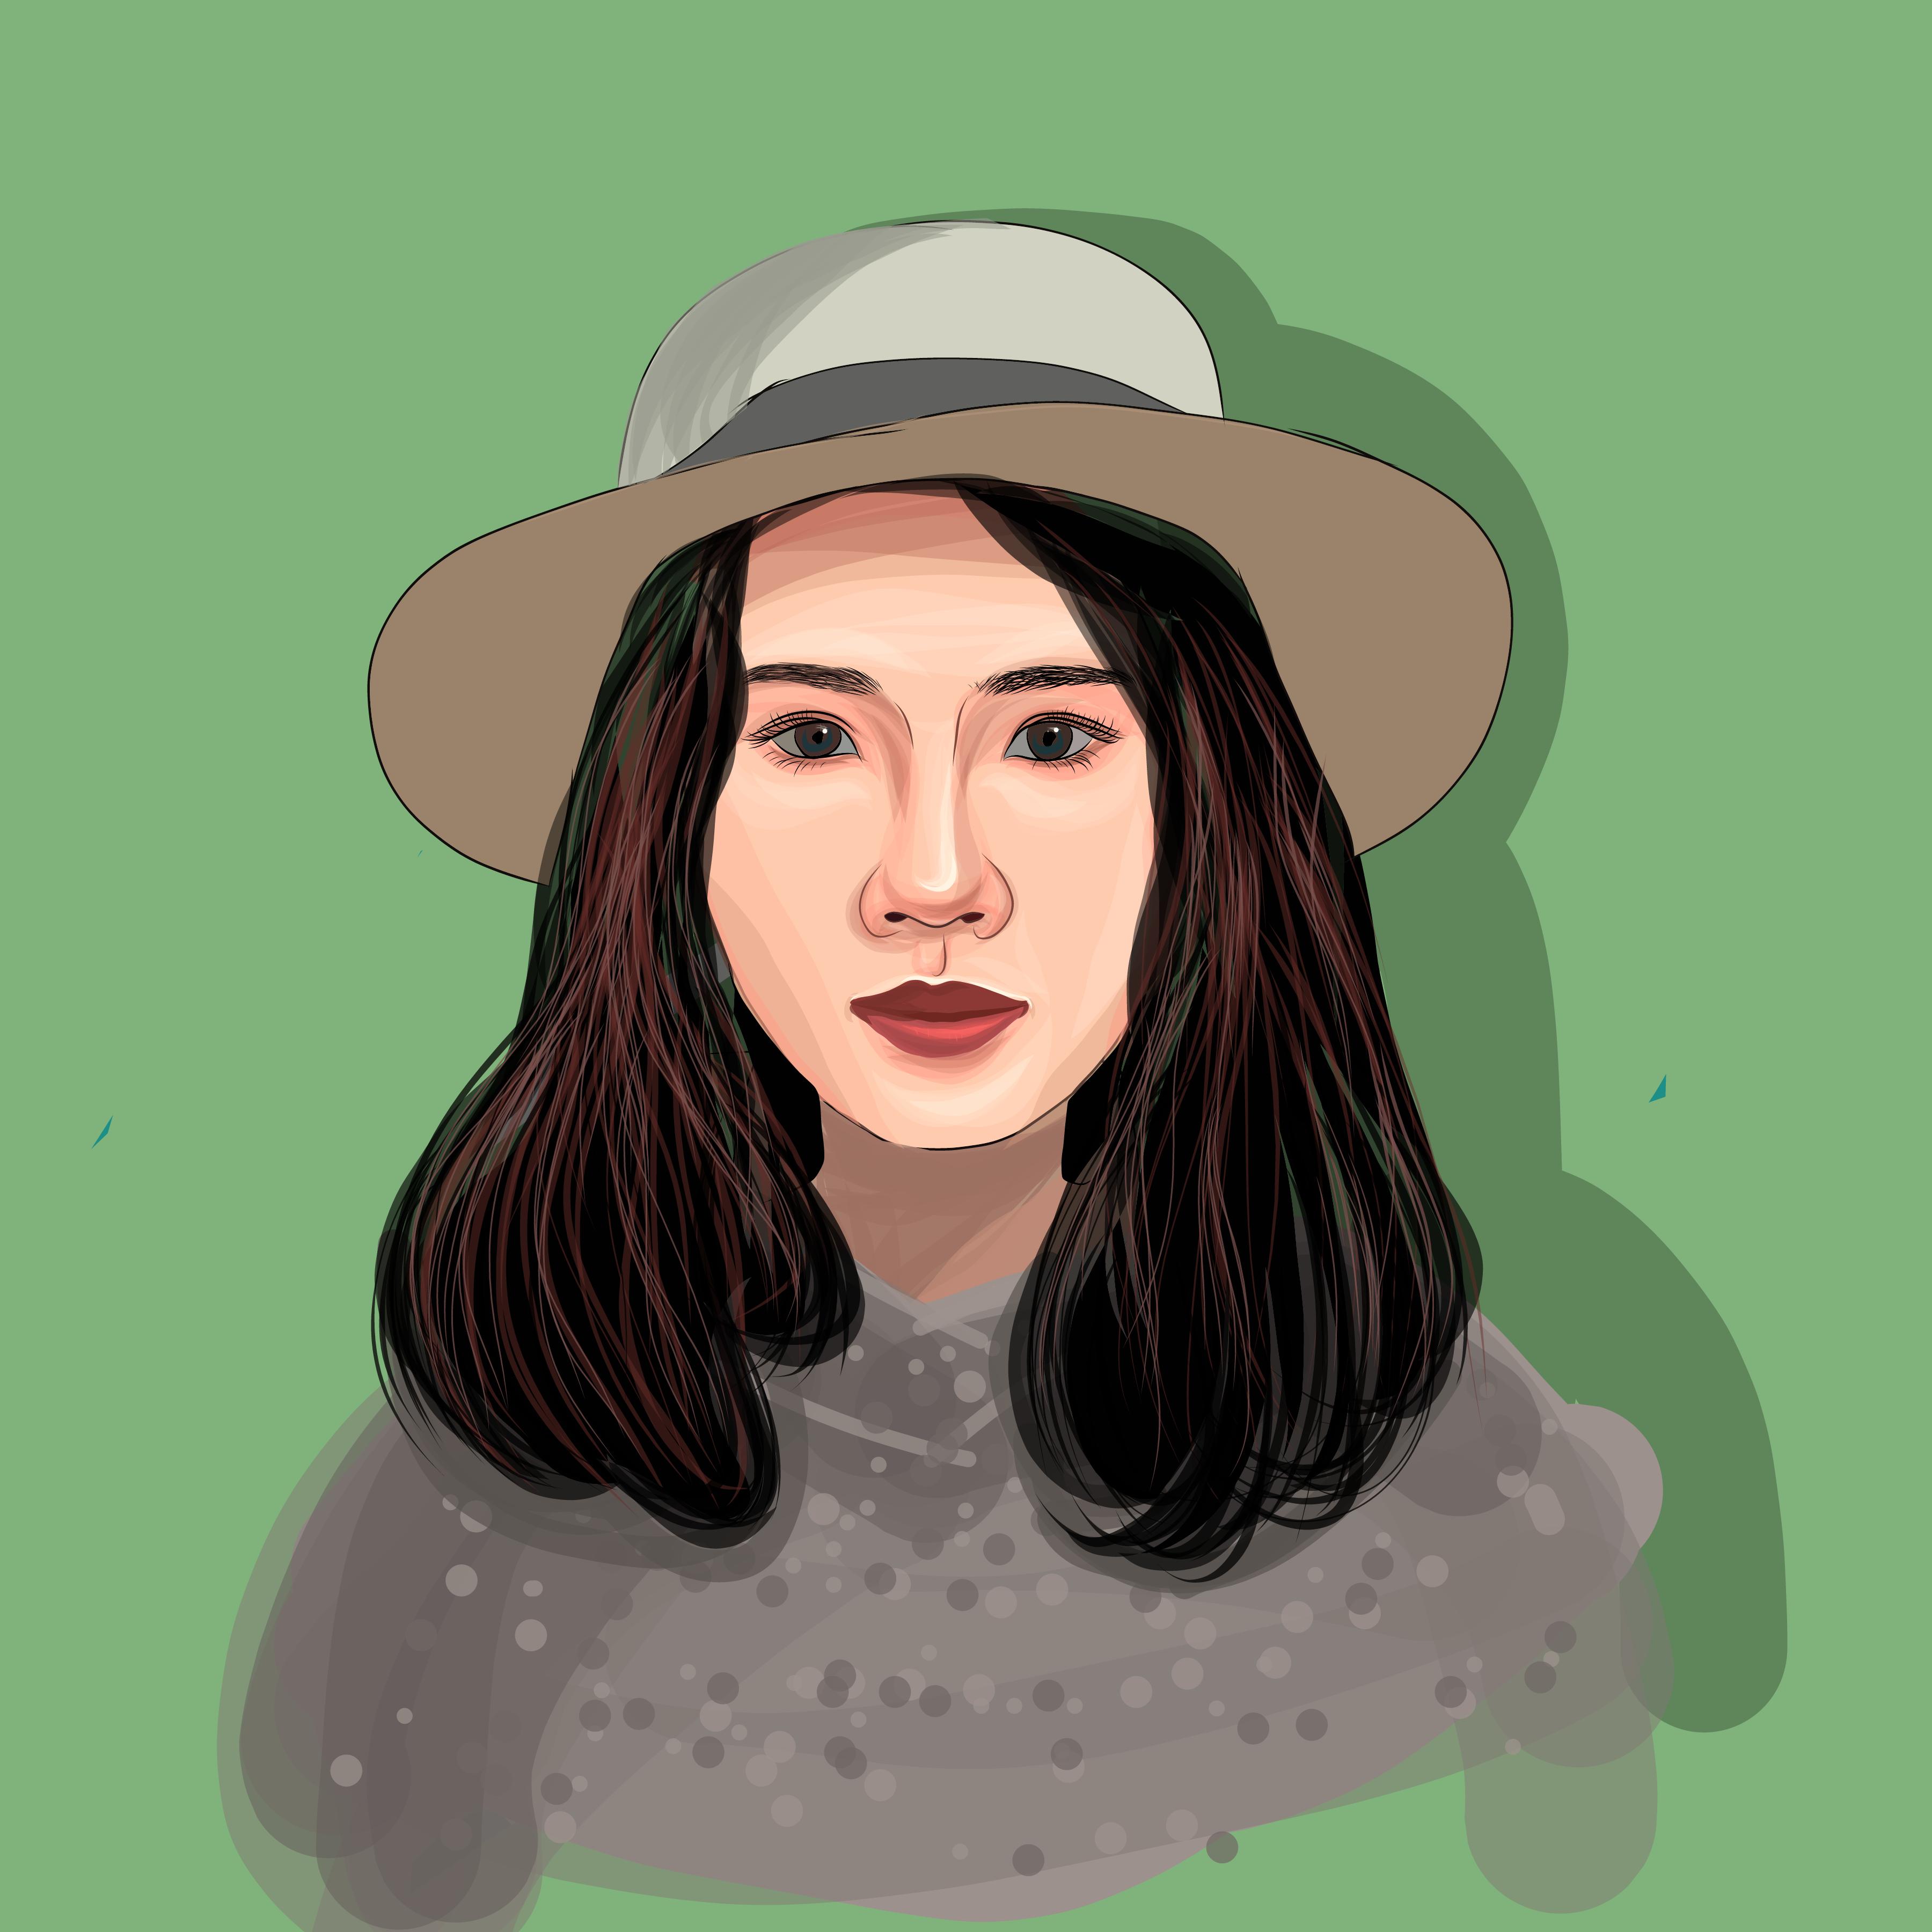 Illustration portrait of a girl